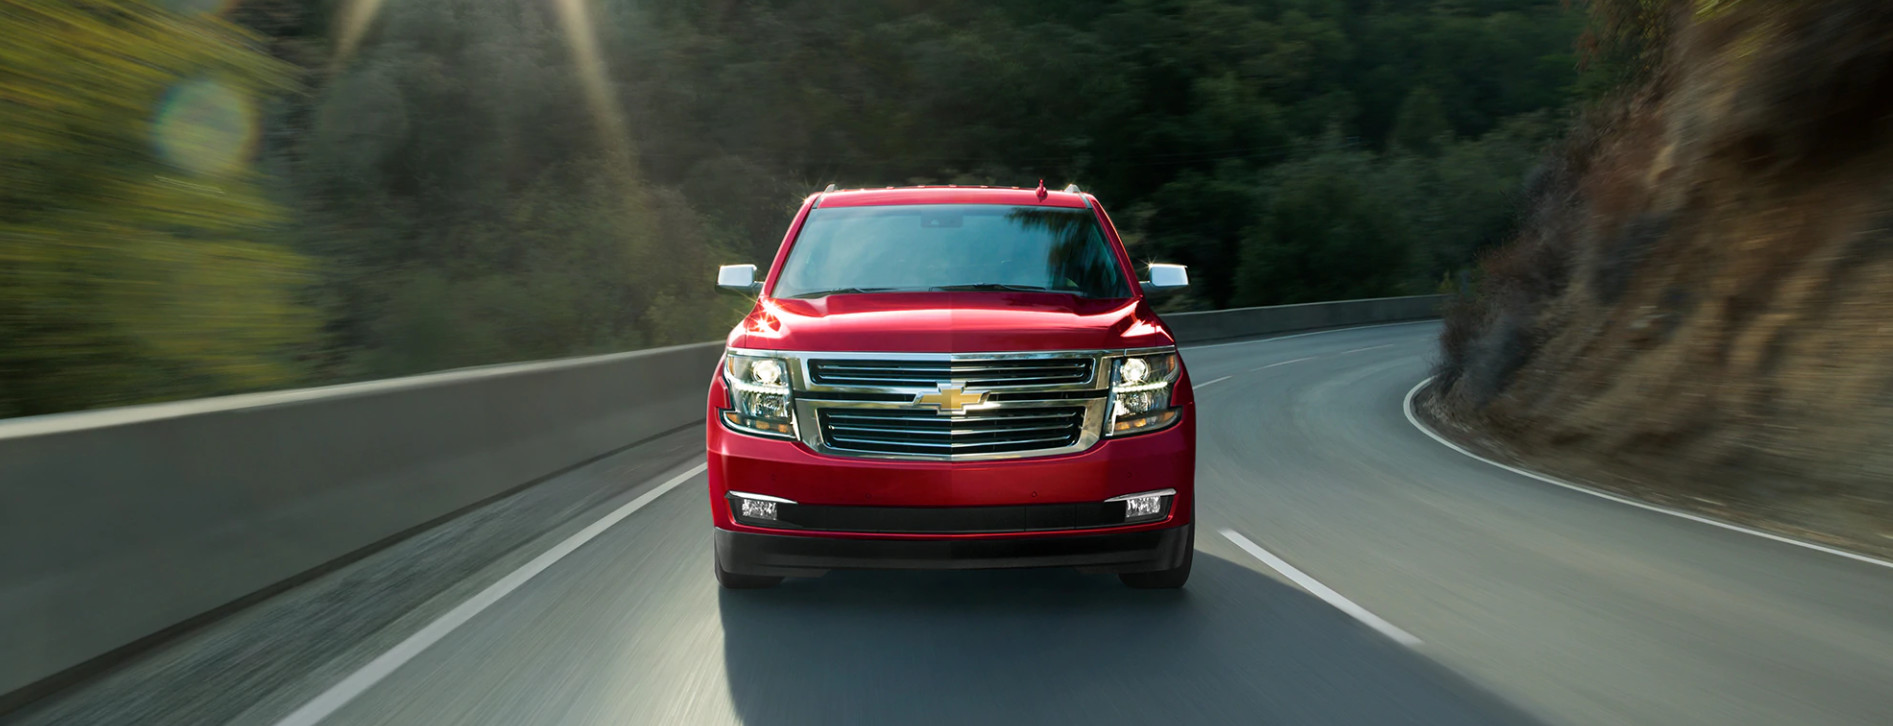 2020 Chevrolet Tahoe Leasing near Manassas, VA